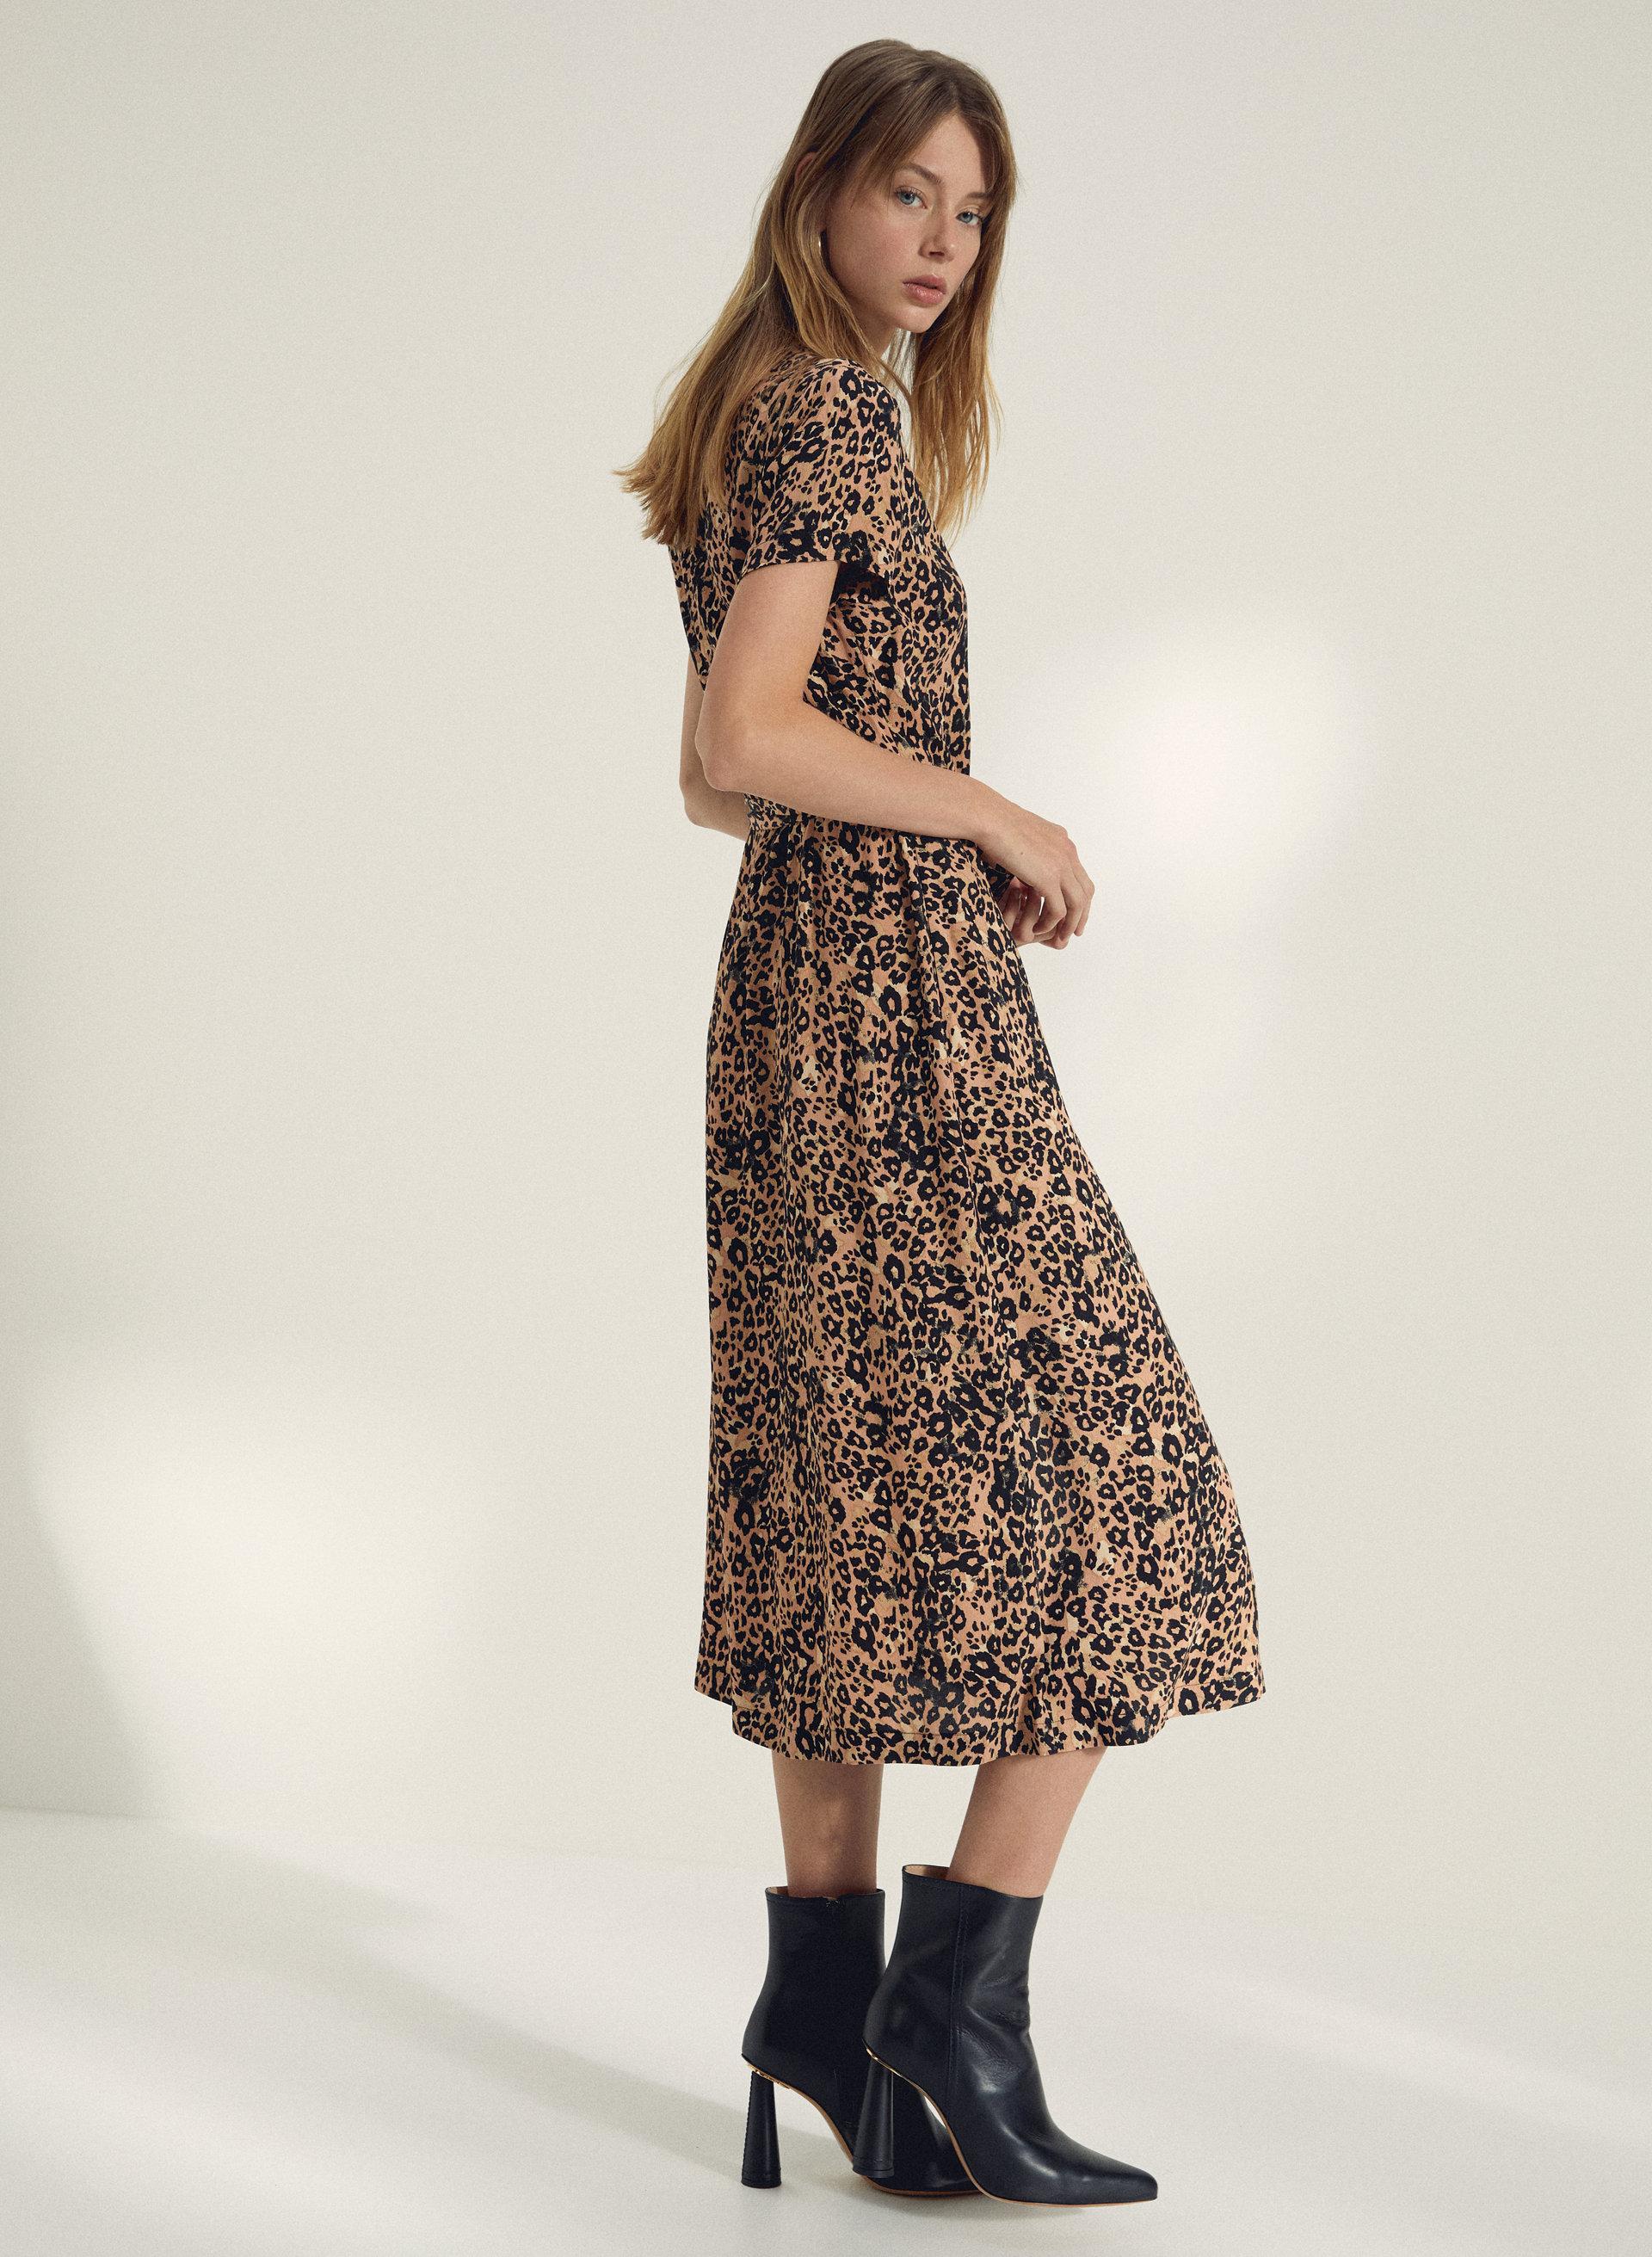 US Womens Leopard Print Short Sleeve Midi Dress Ladies Button Down Shirt Dresses